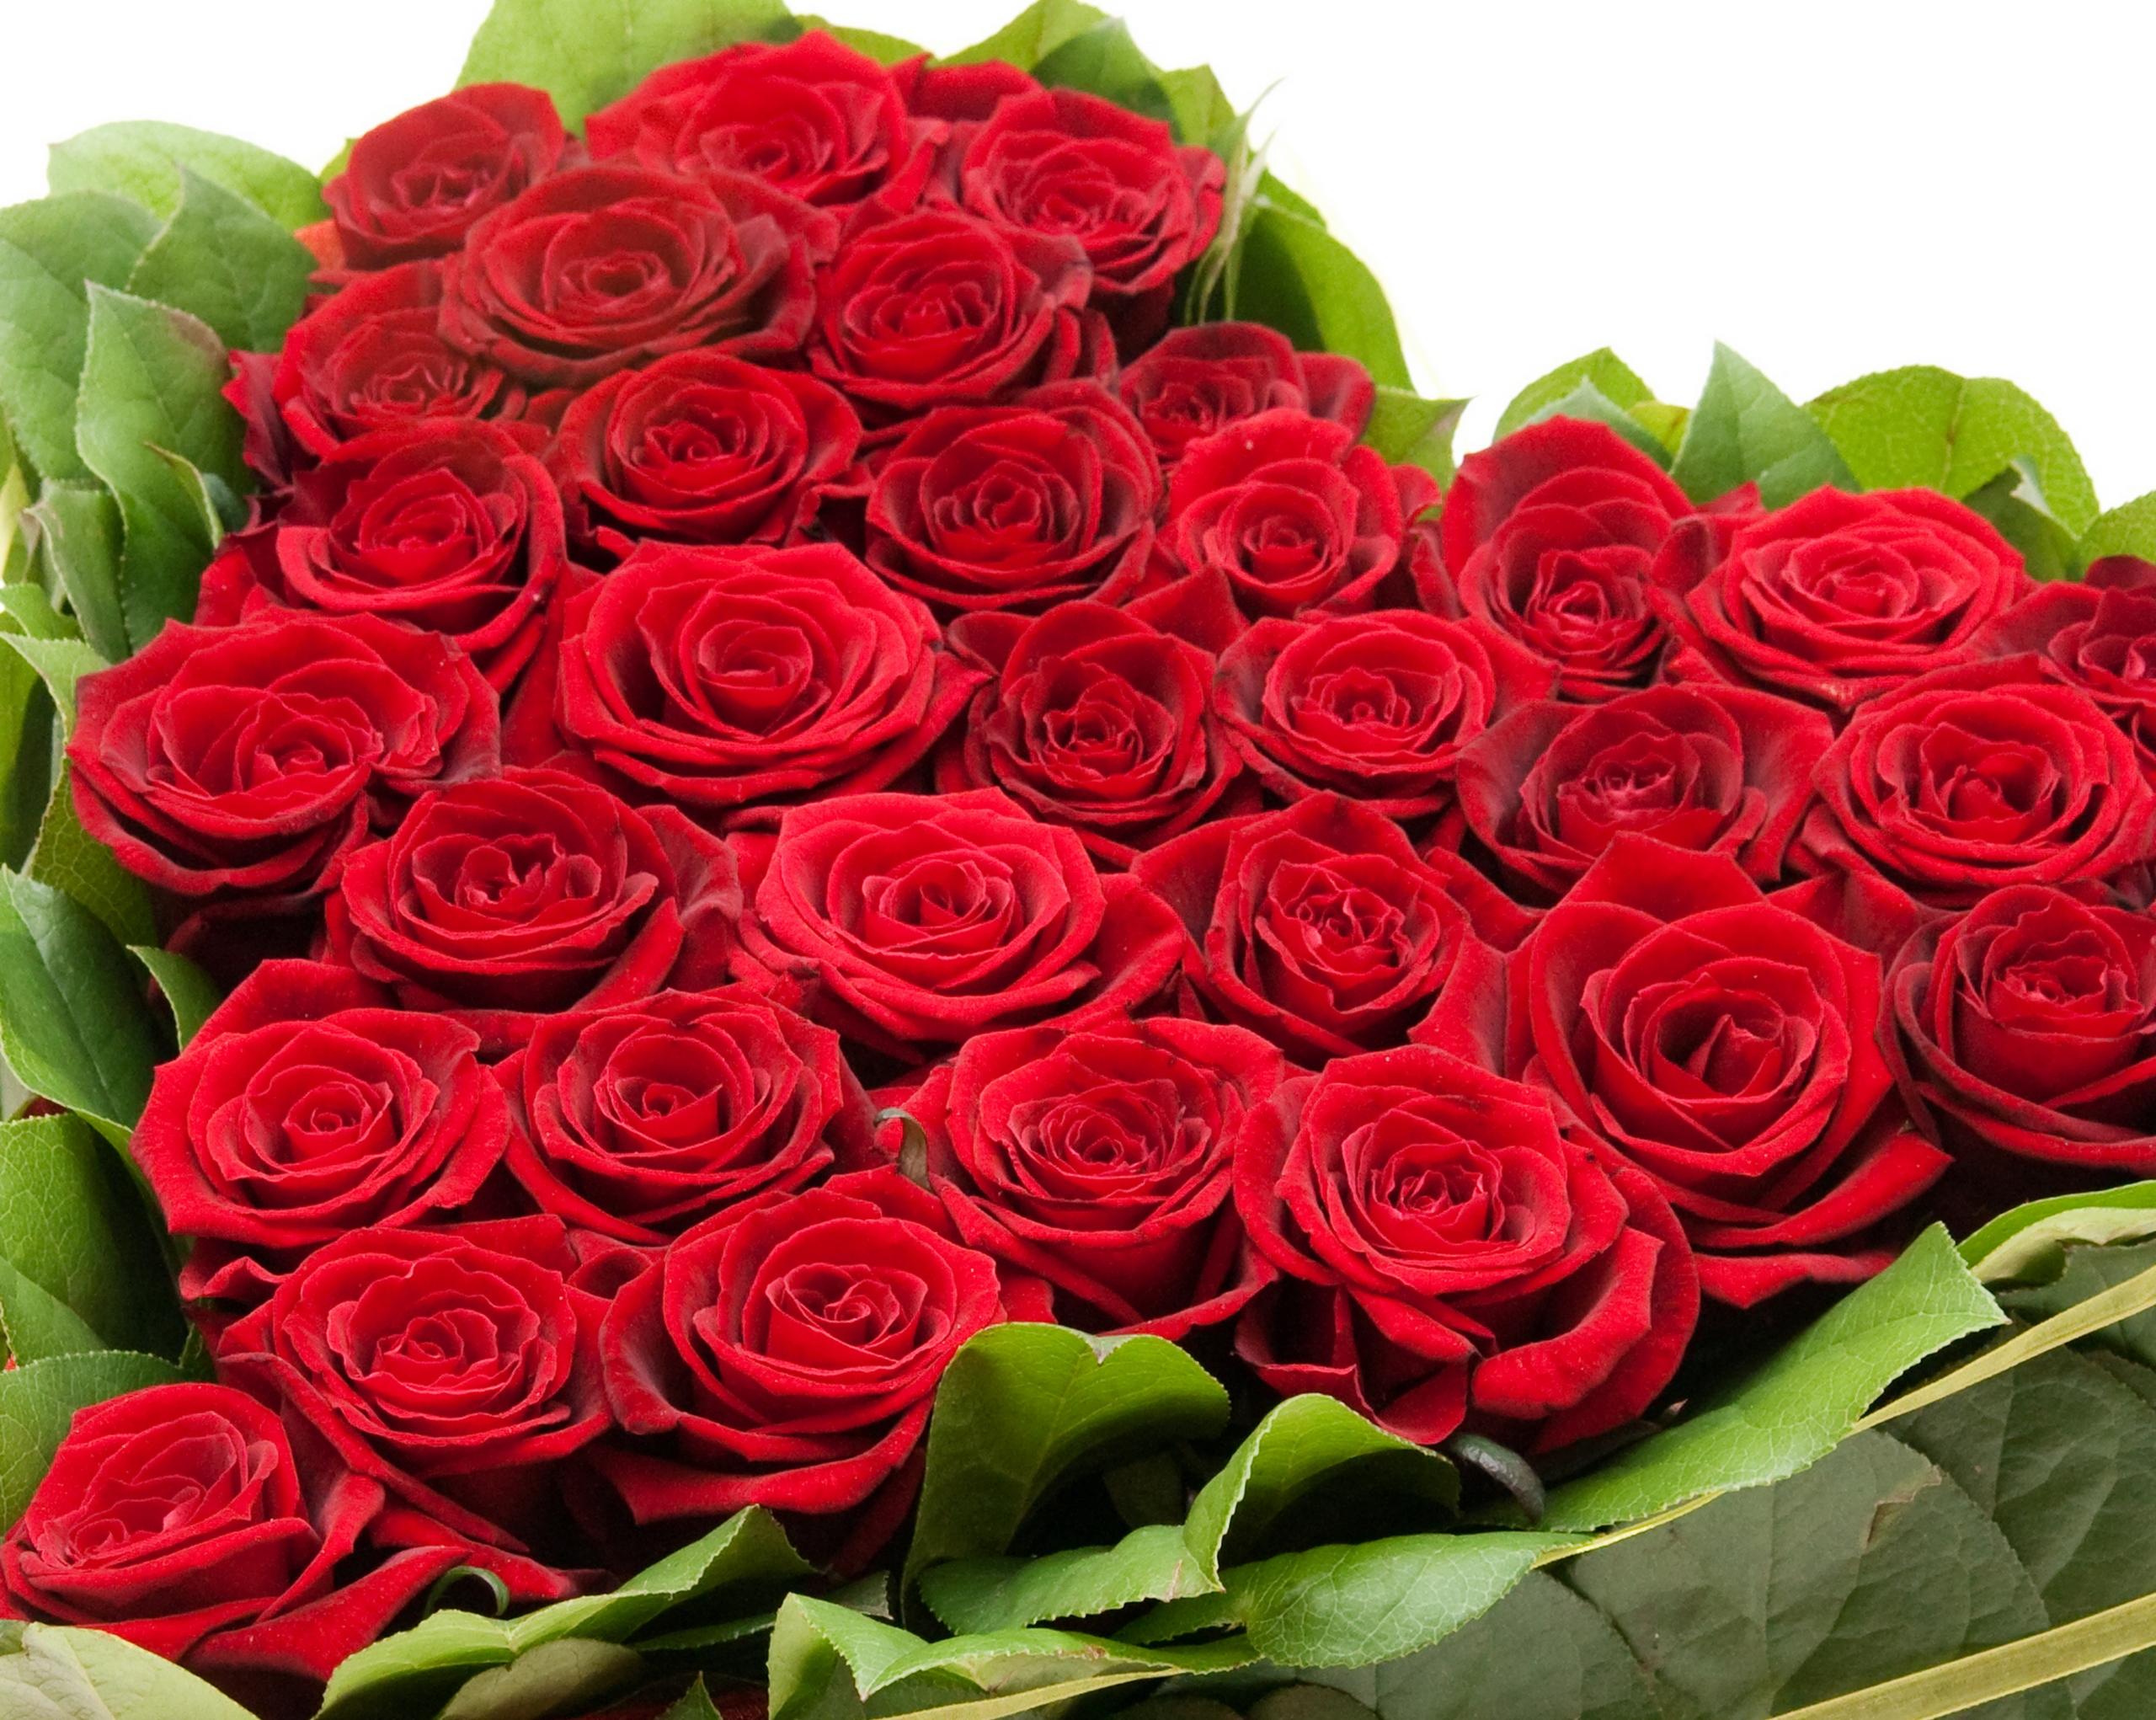 Картинки цветов для красивой девушки